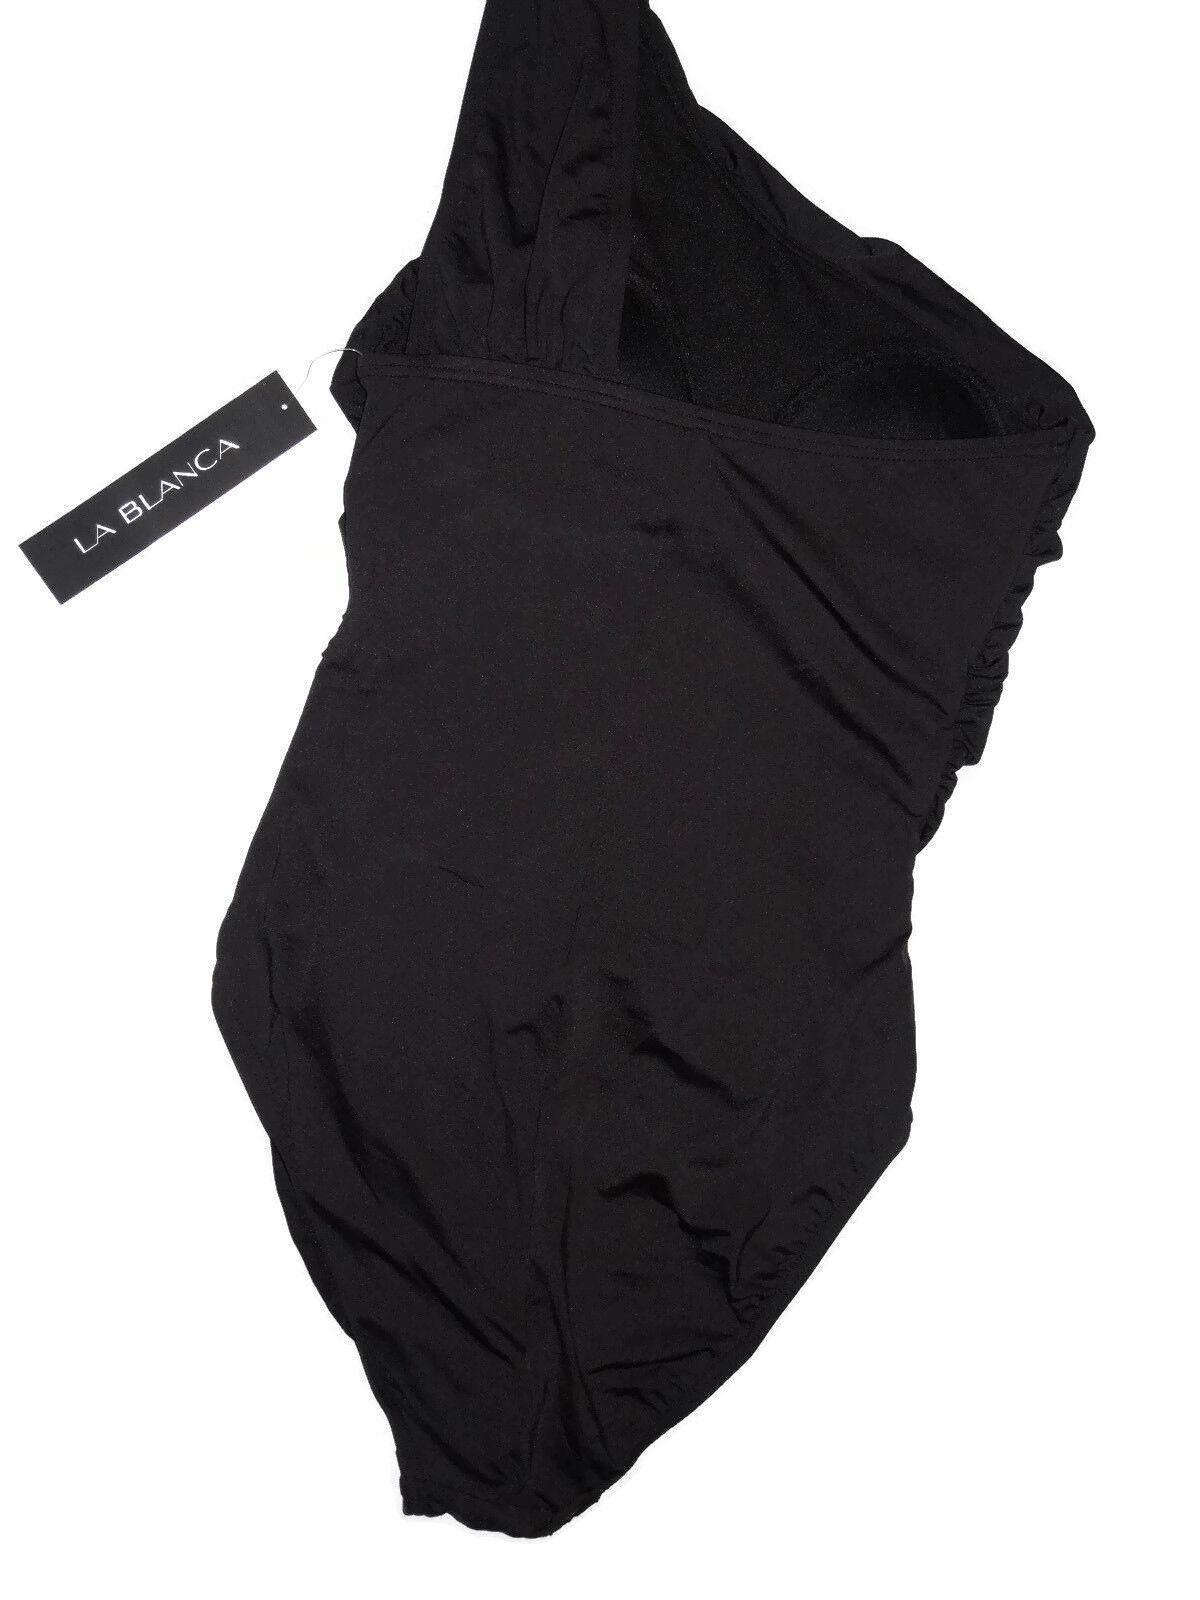 ba12d74297 La Blanca Women S 6 Black Ruched One Shoulder Swimsuit 109 LB 4 KV 14 for sale  online | eBay